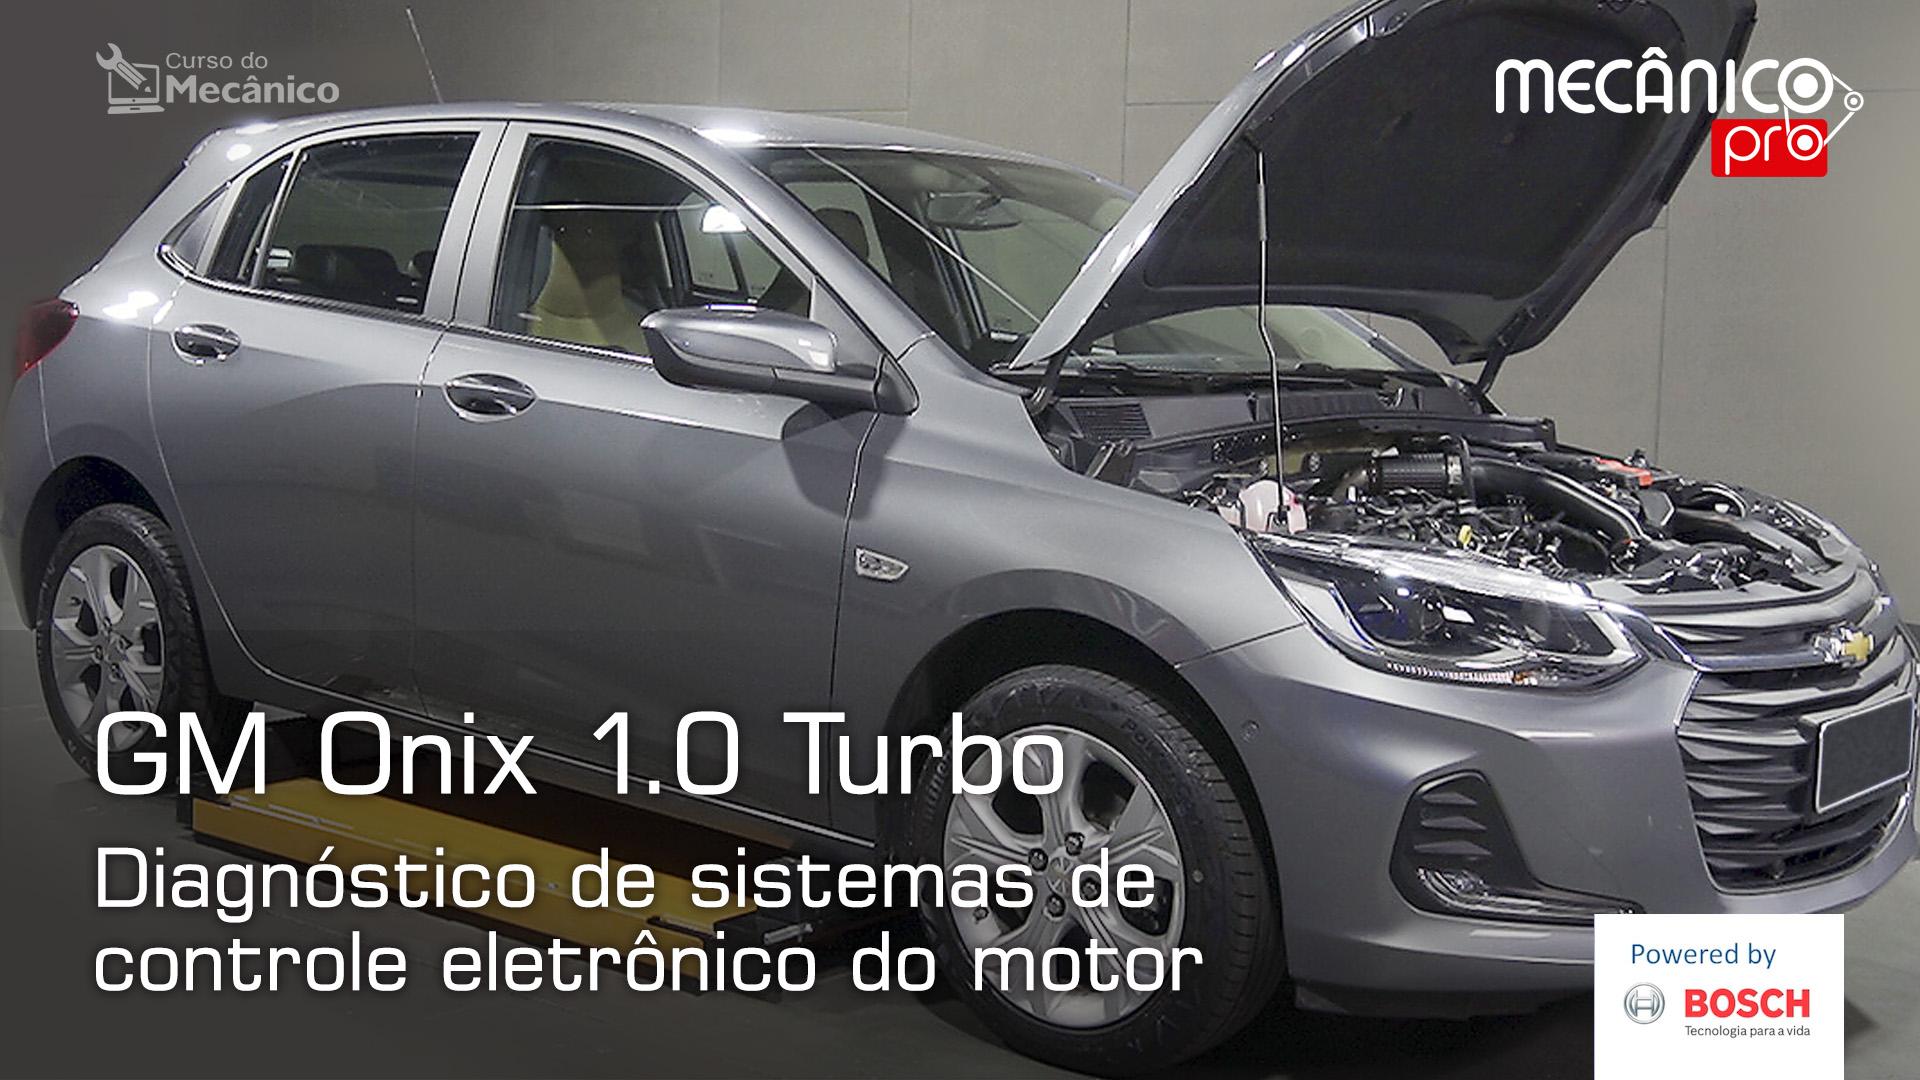 GM Onix 1.0 Turbo